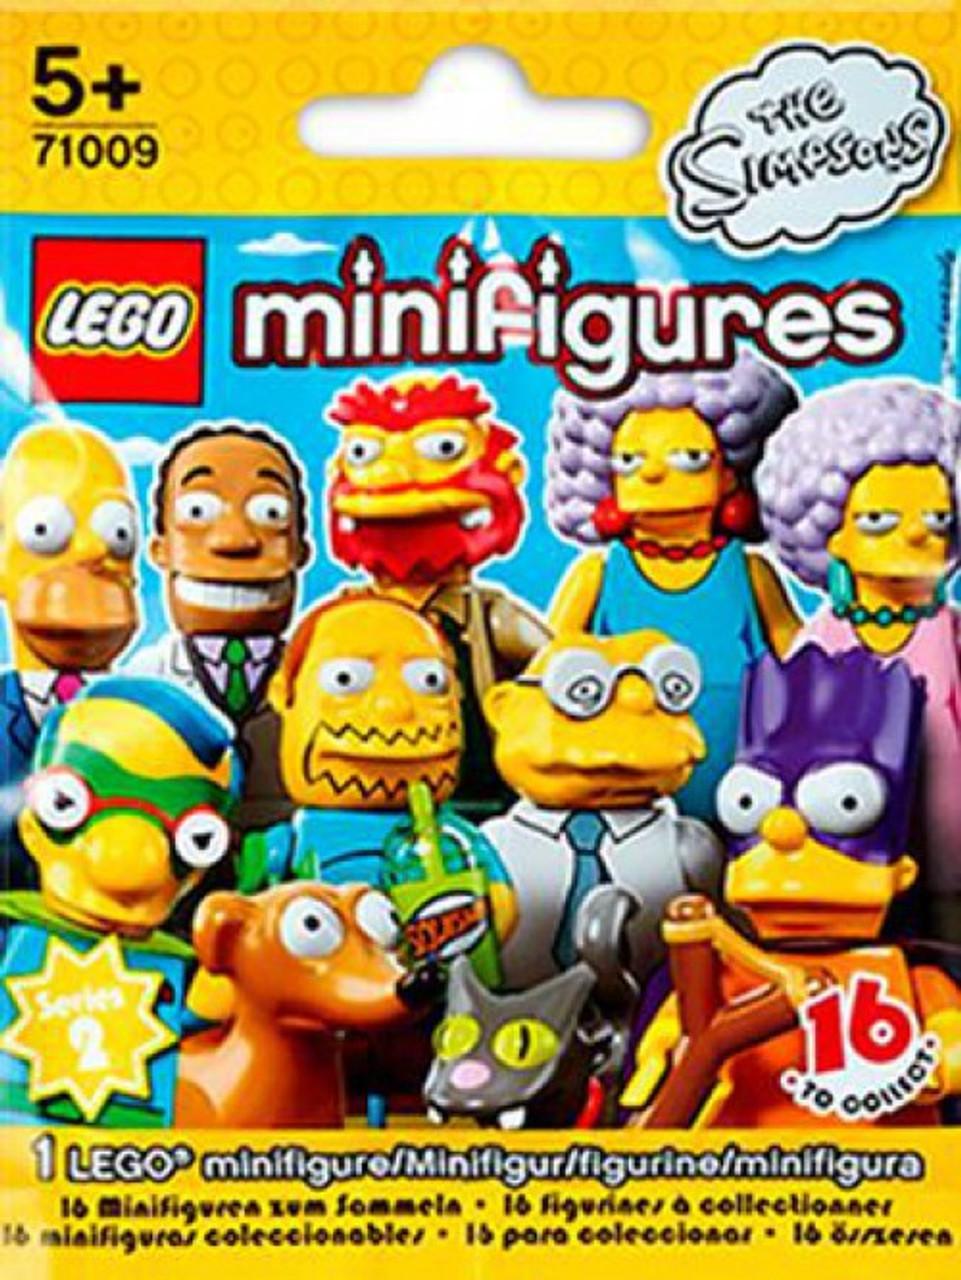 Lego Minifigure Simpson Series 2 Groundskeeper Willie